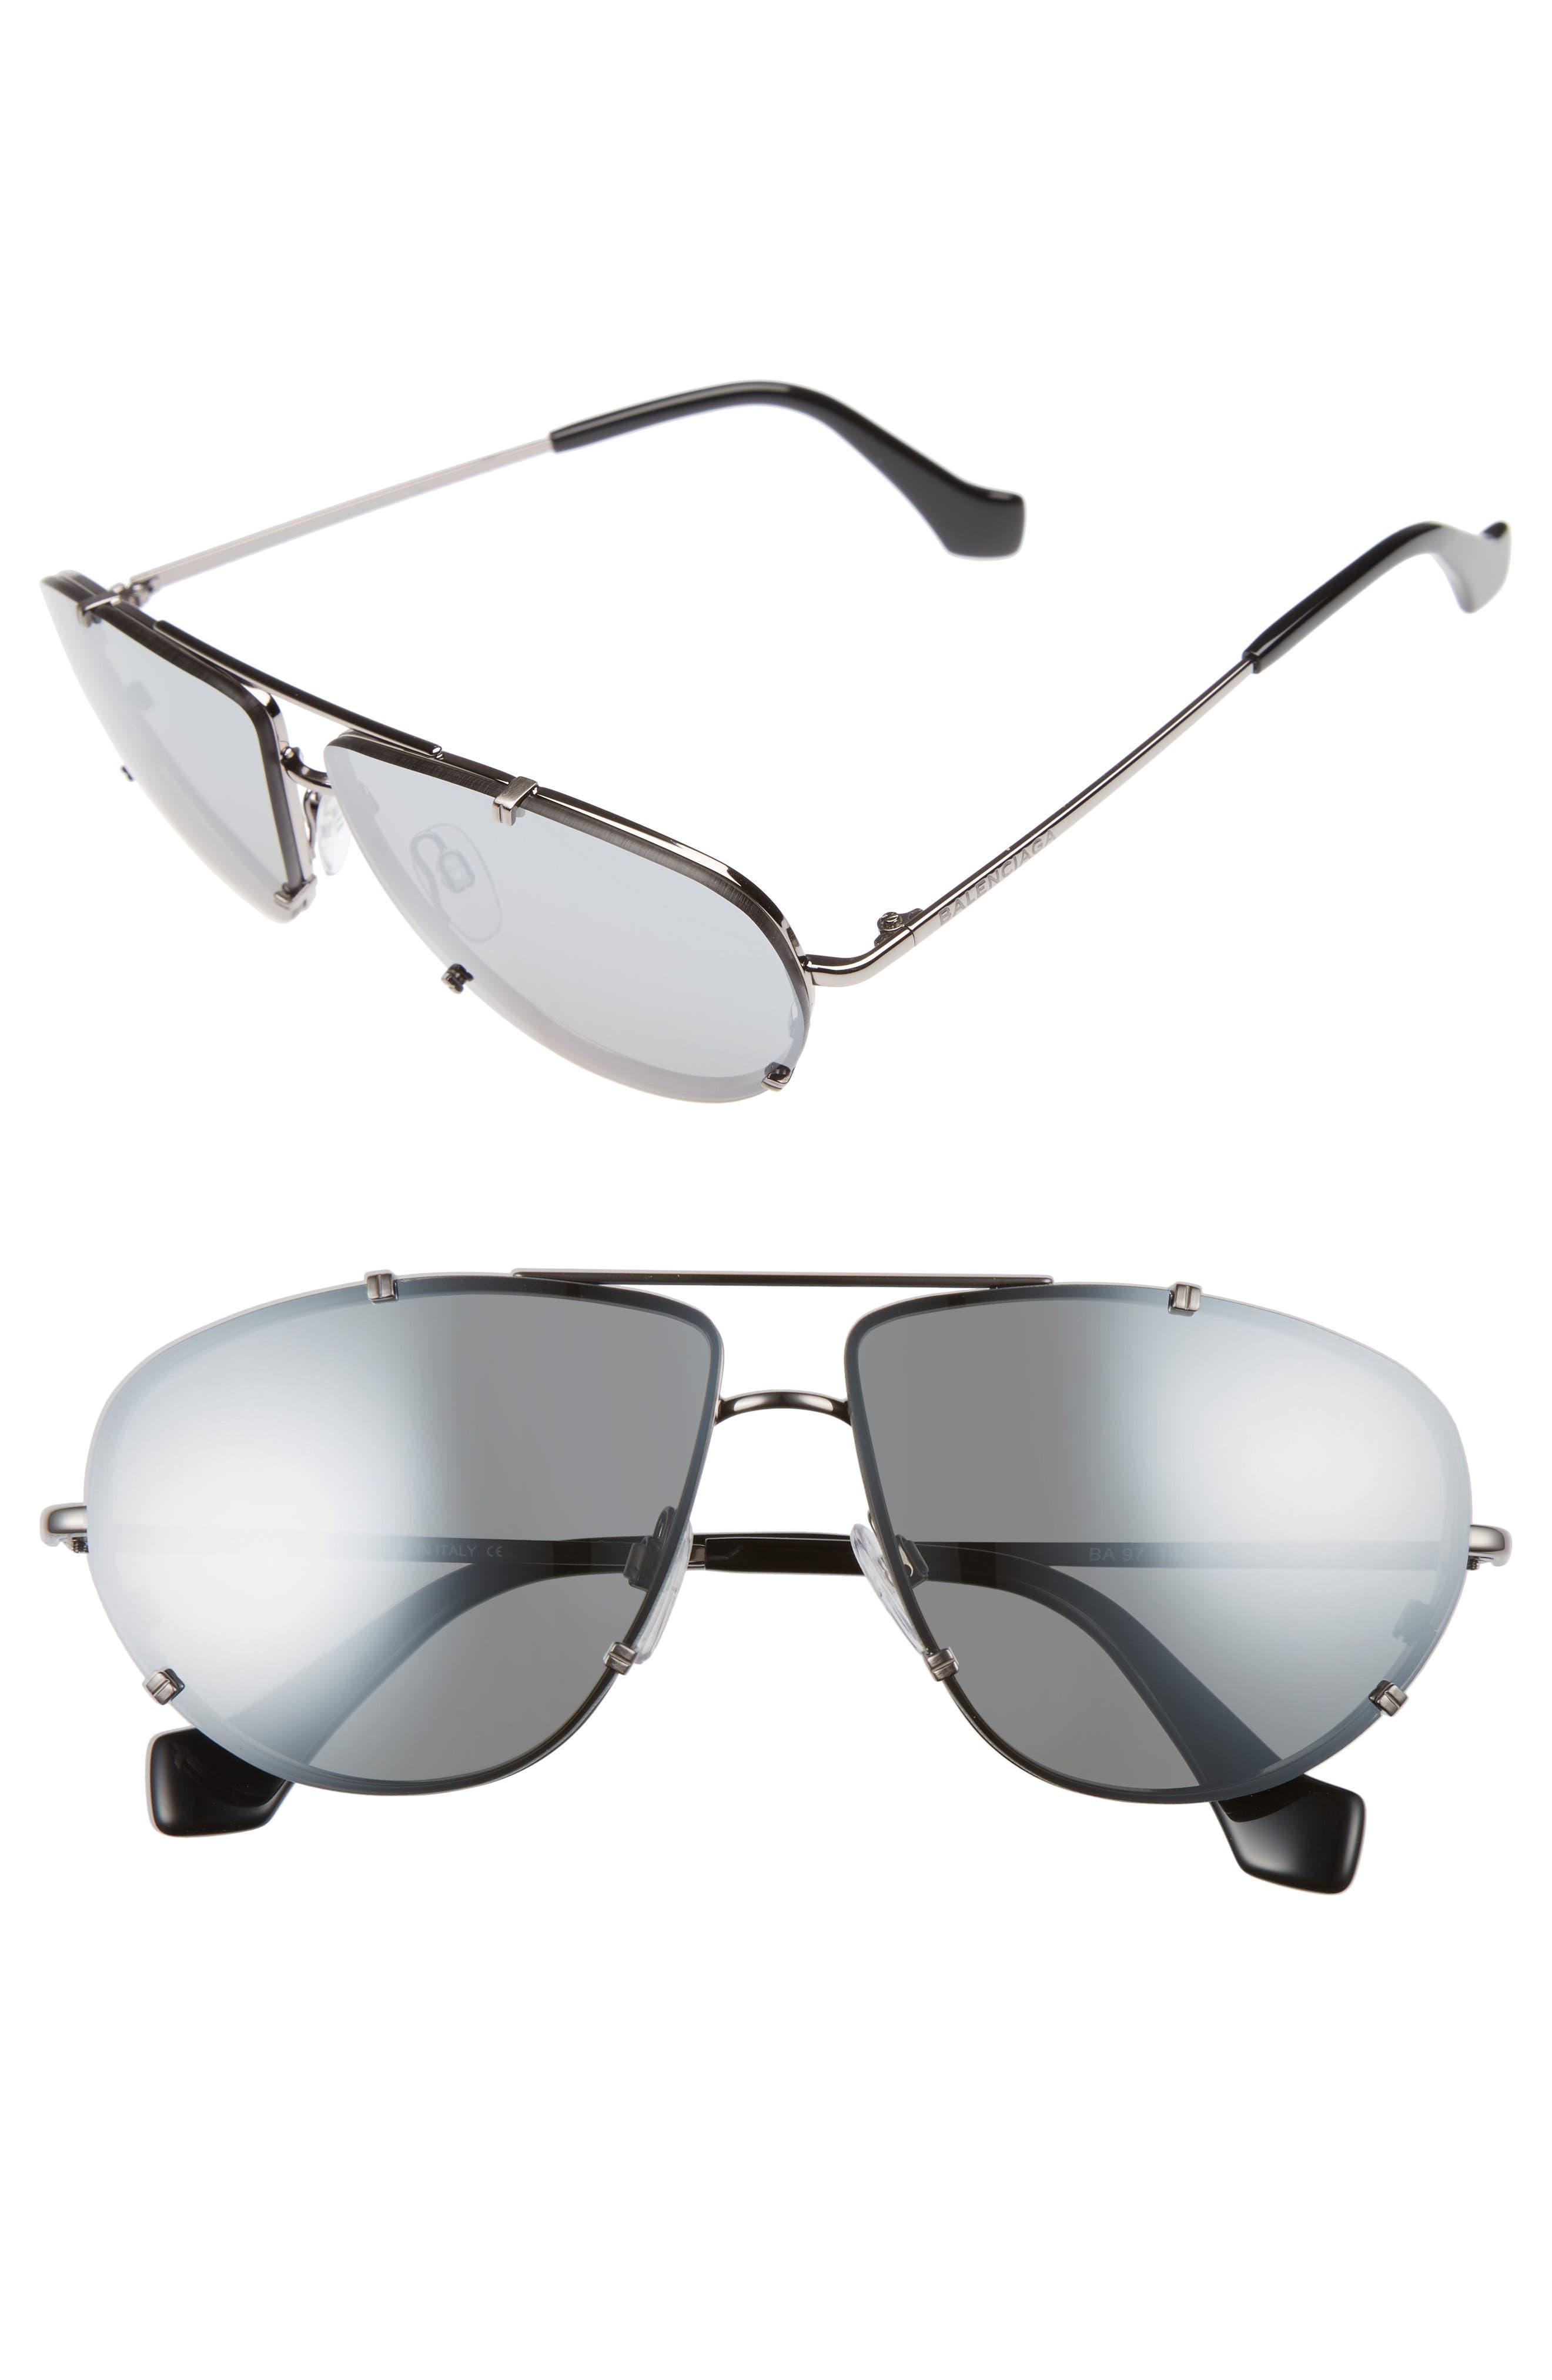 62mm Aviator Sunglasses,                         Main,                         color, Ruthenium/ Black/ Smoke Mirror